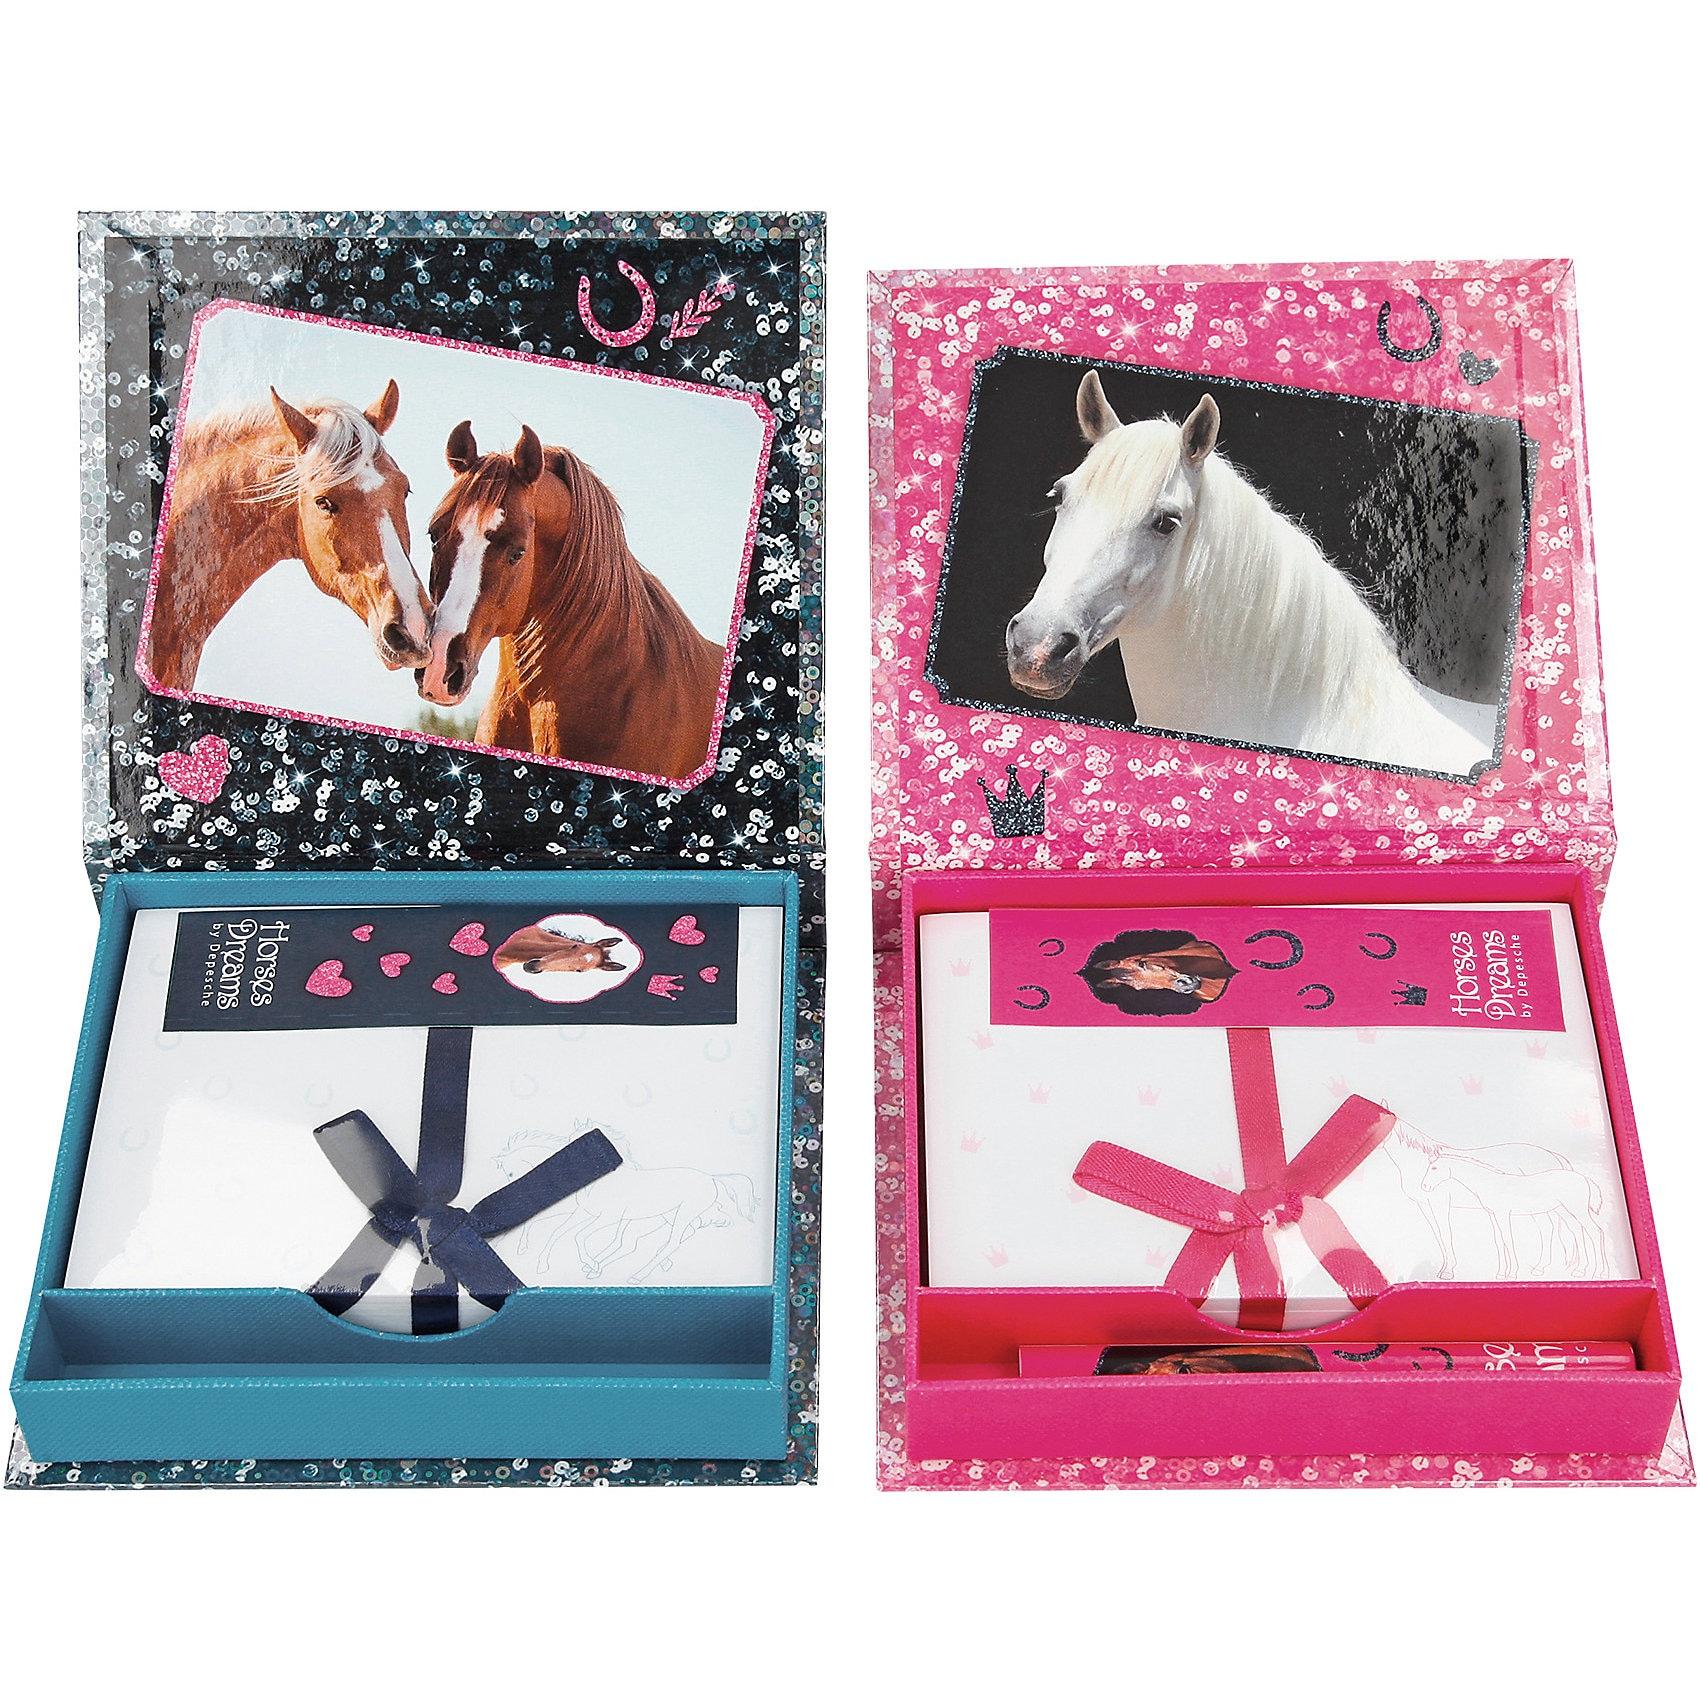 Depesche Horses Dreams Zettelbox